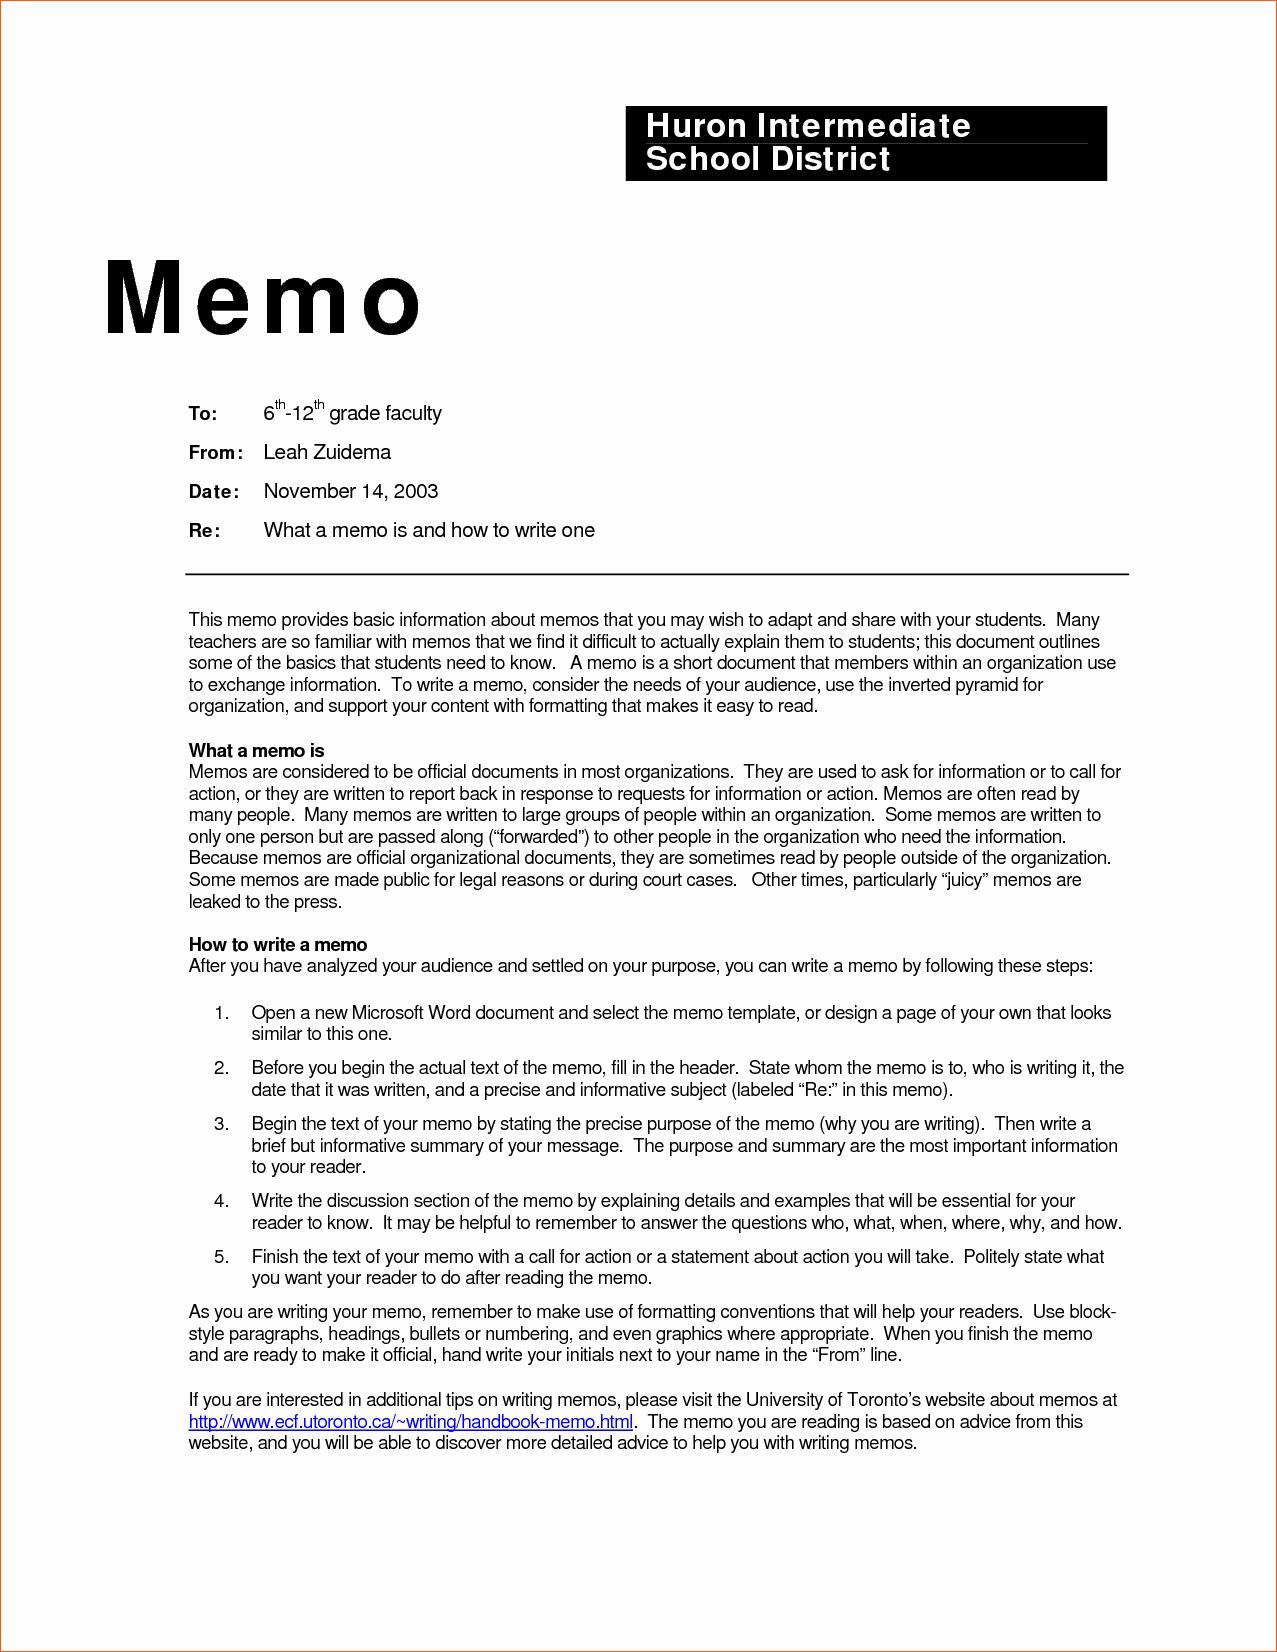 Standard Business Letter format Template Luxury Sample Standard Memo Template for School Fice Vatansun